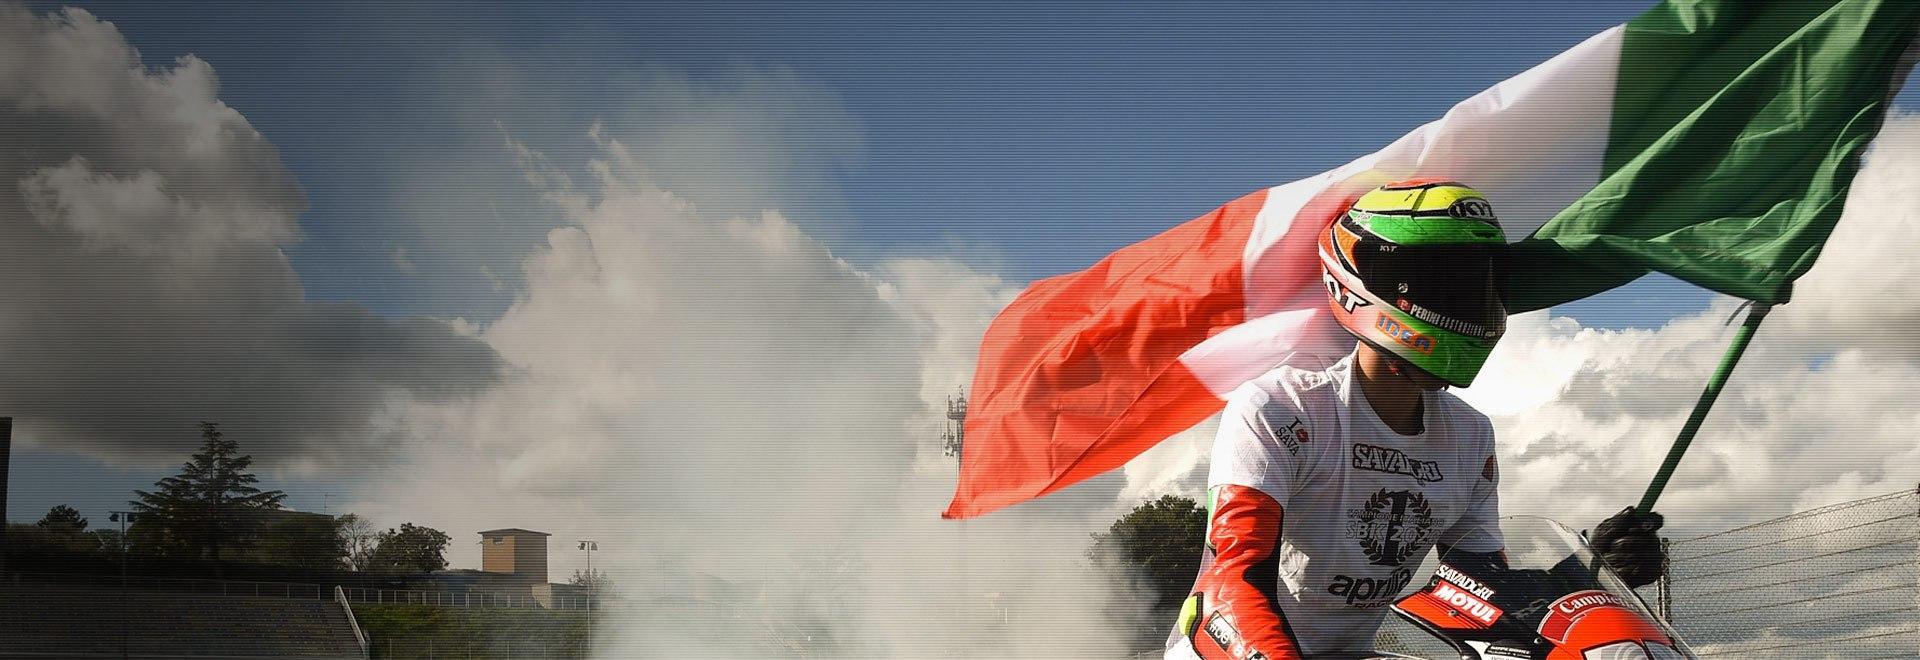 GP Mugello: Supersport